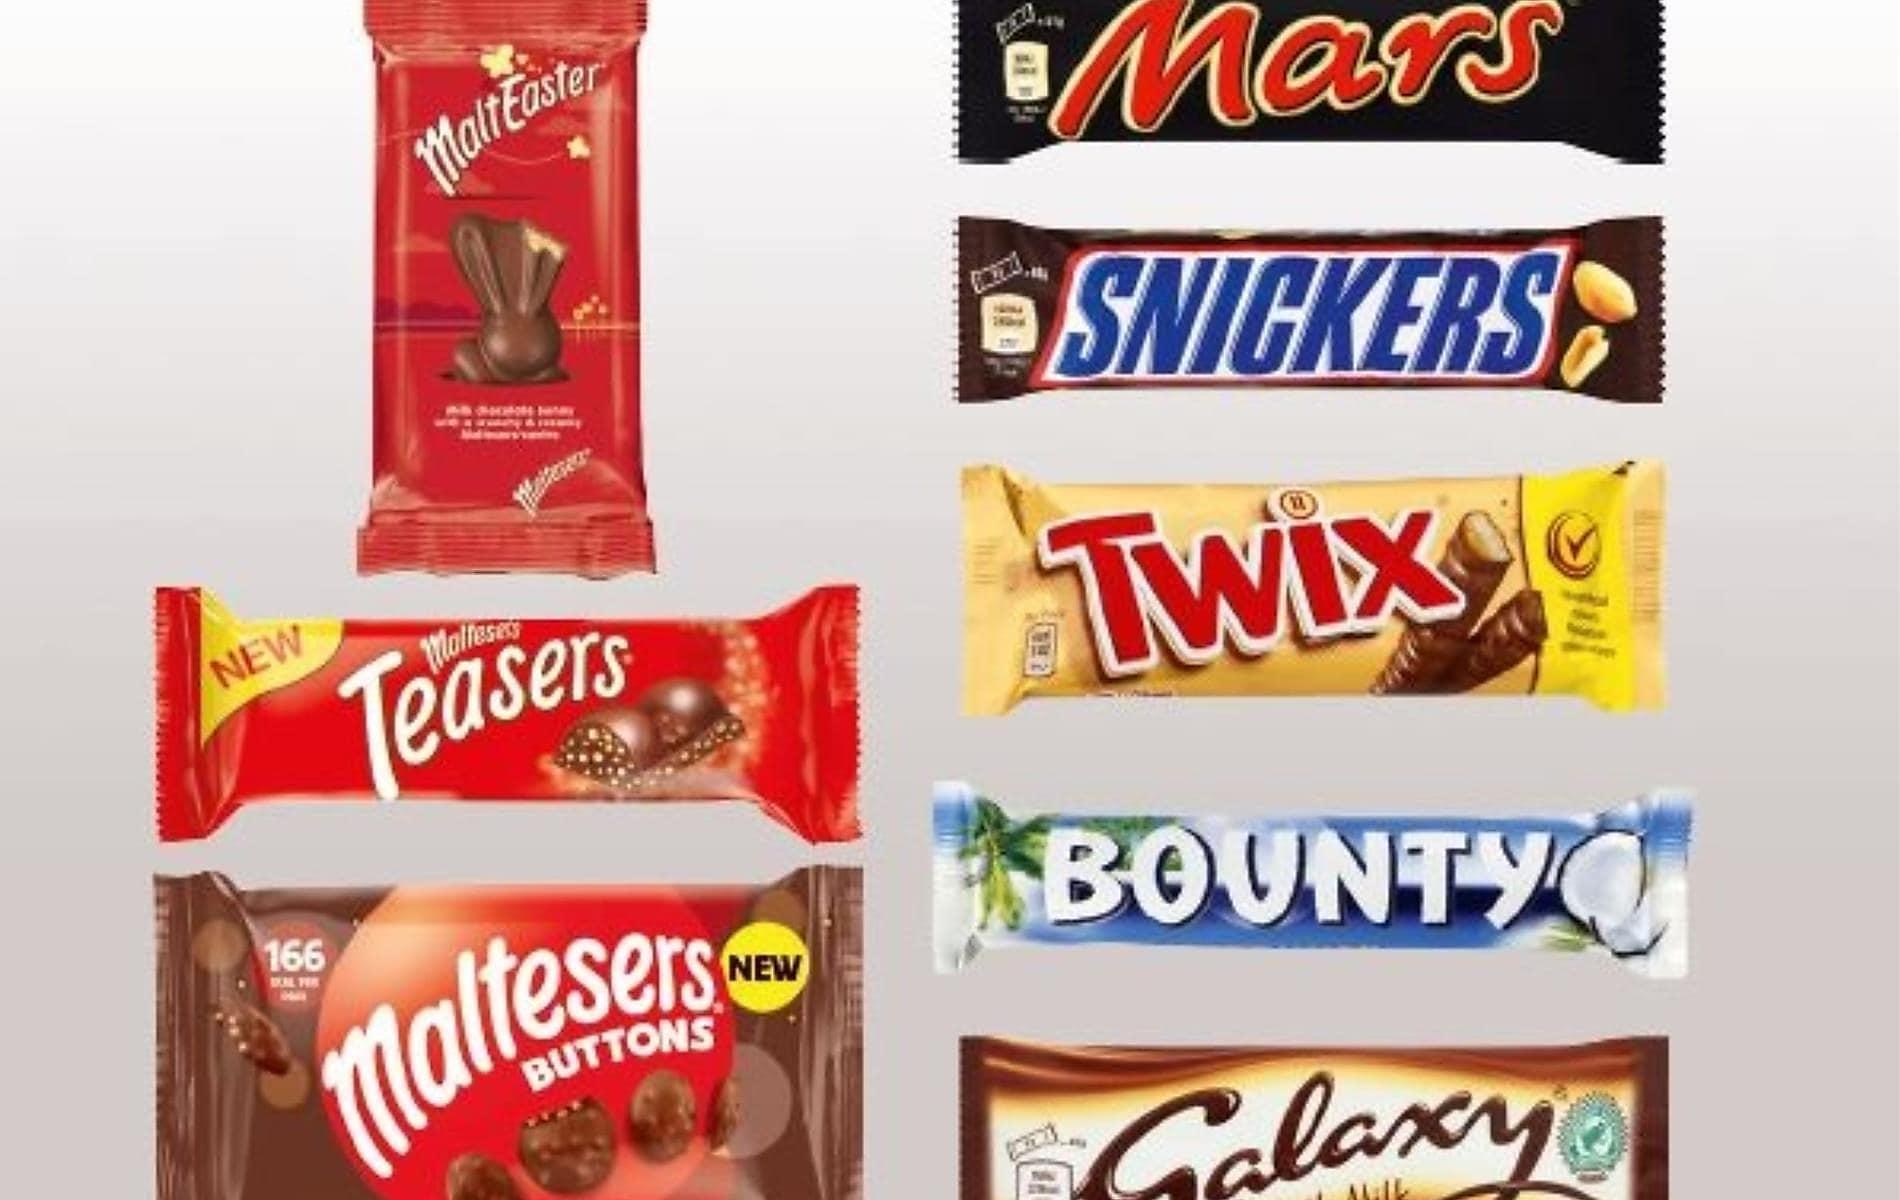 Mars Chocolate 2 for £1